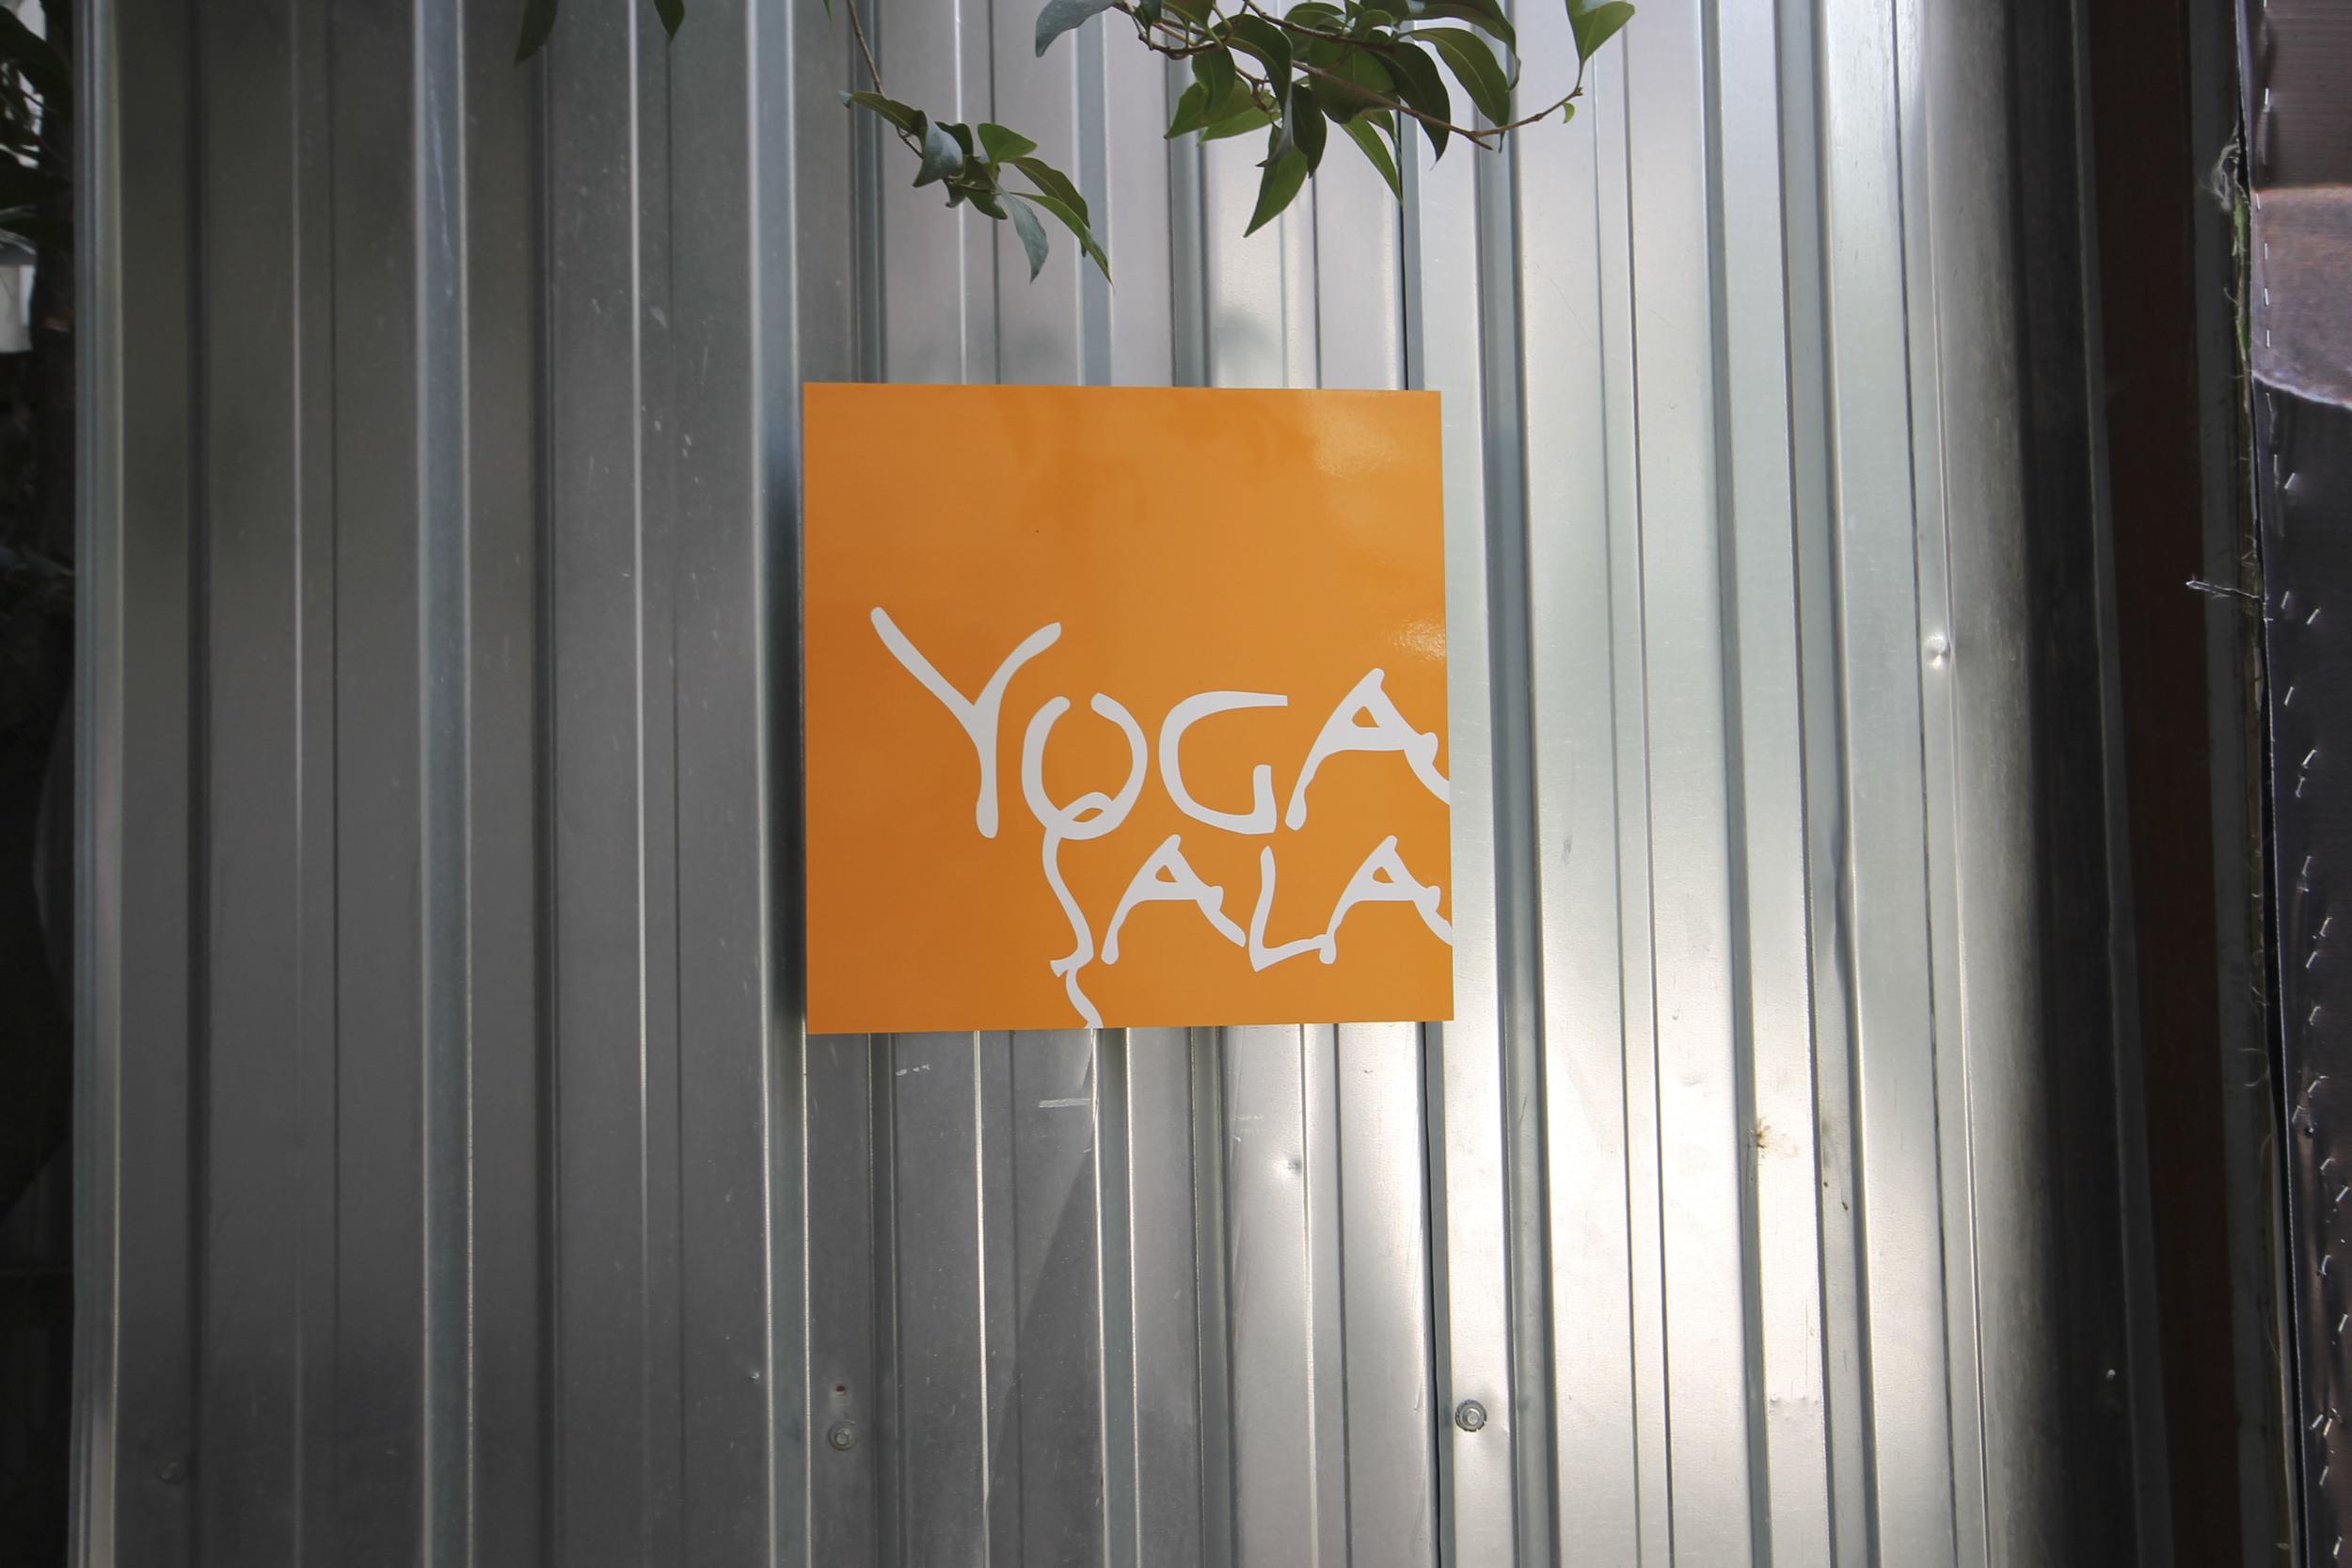 Yoga Studio_Yoga Sala Asien Istanbul 2989.jpg